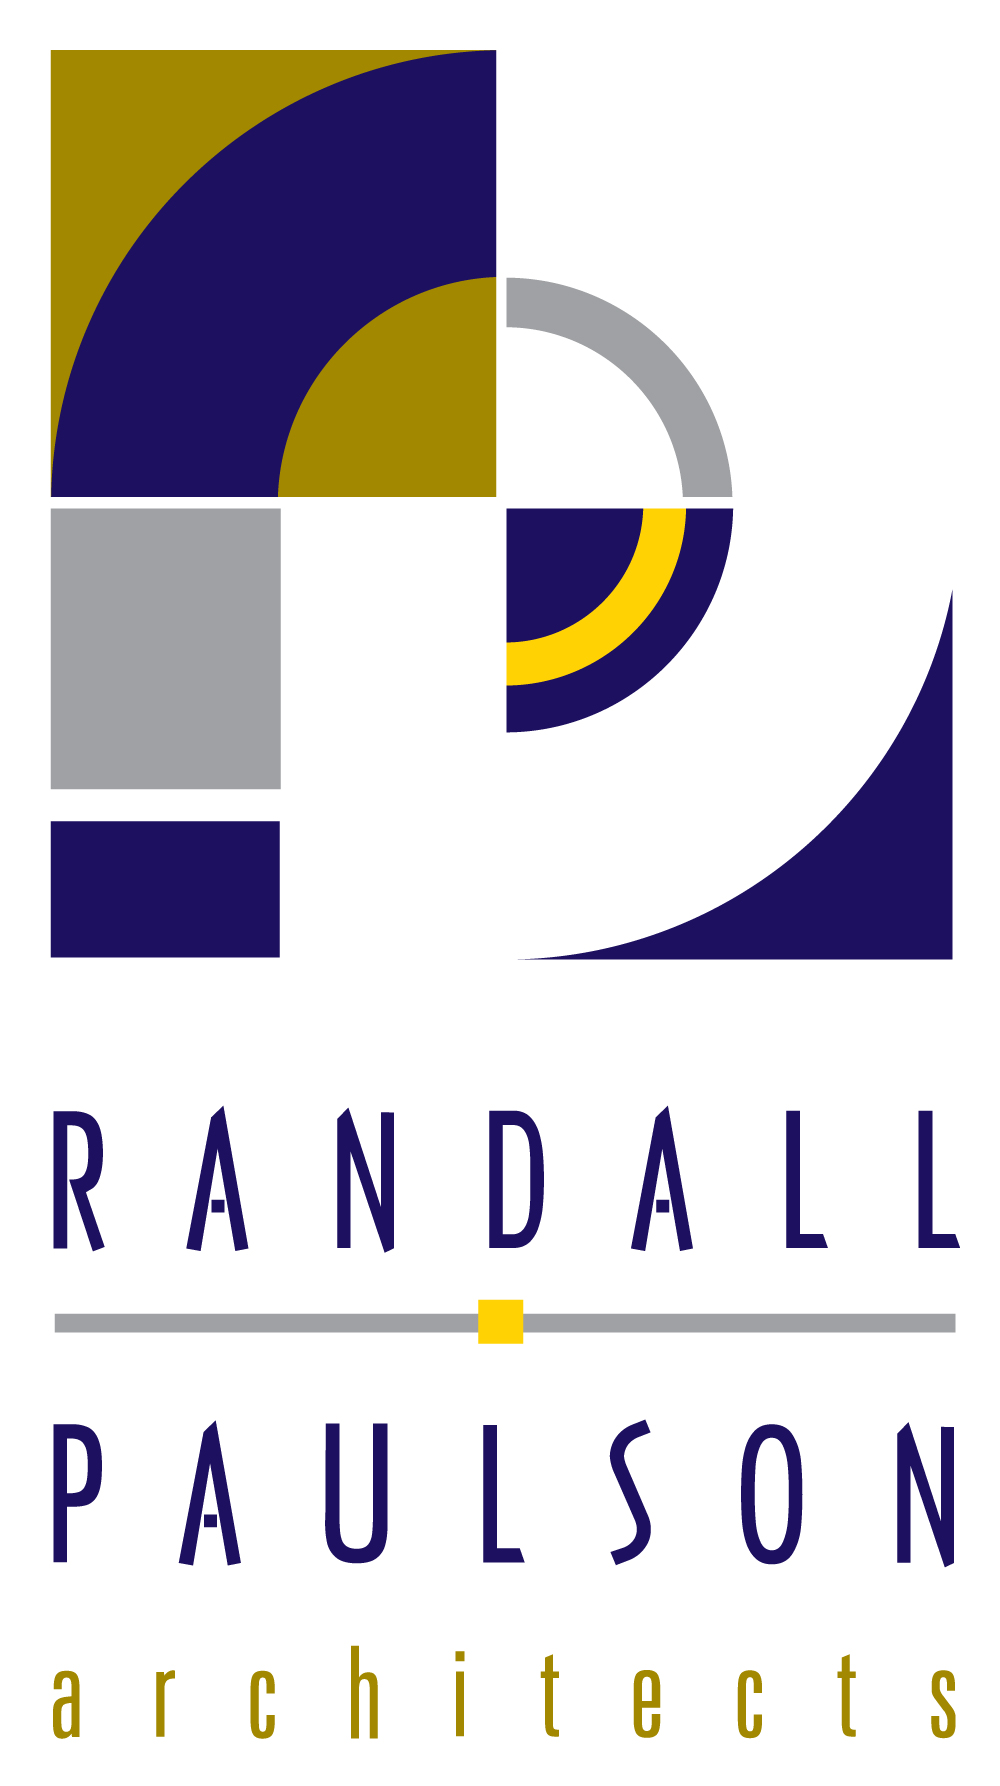 16RandallPaulson.jpg